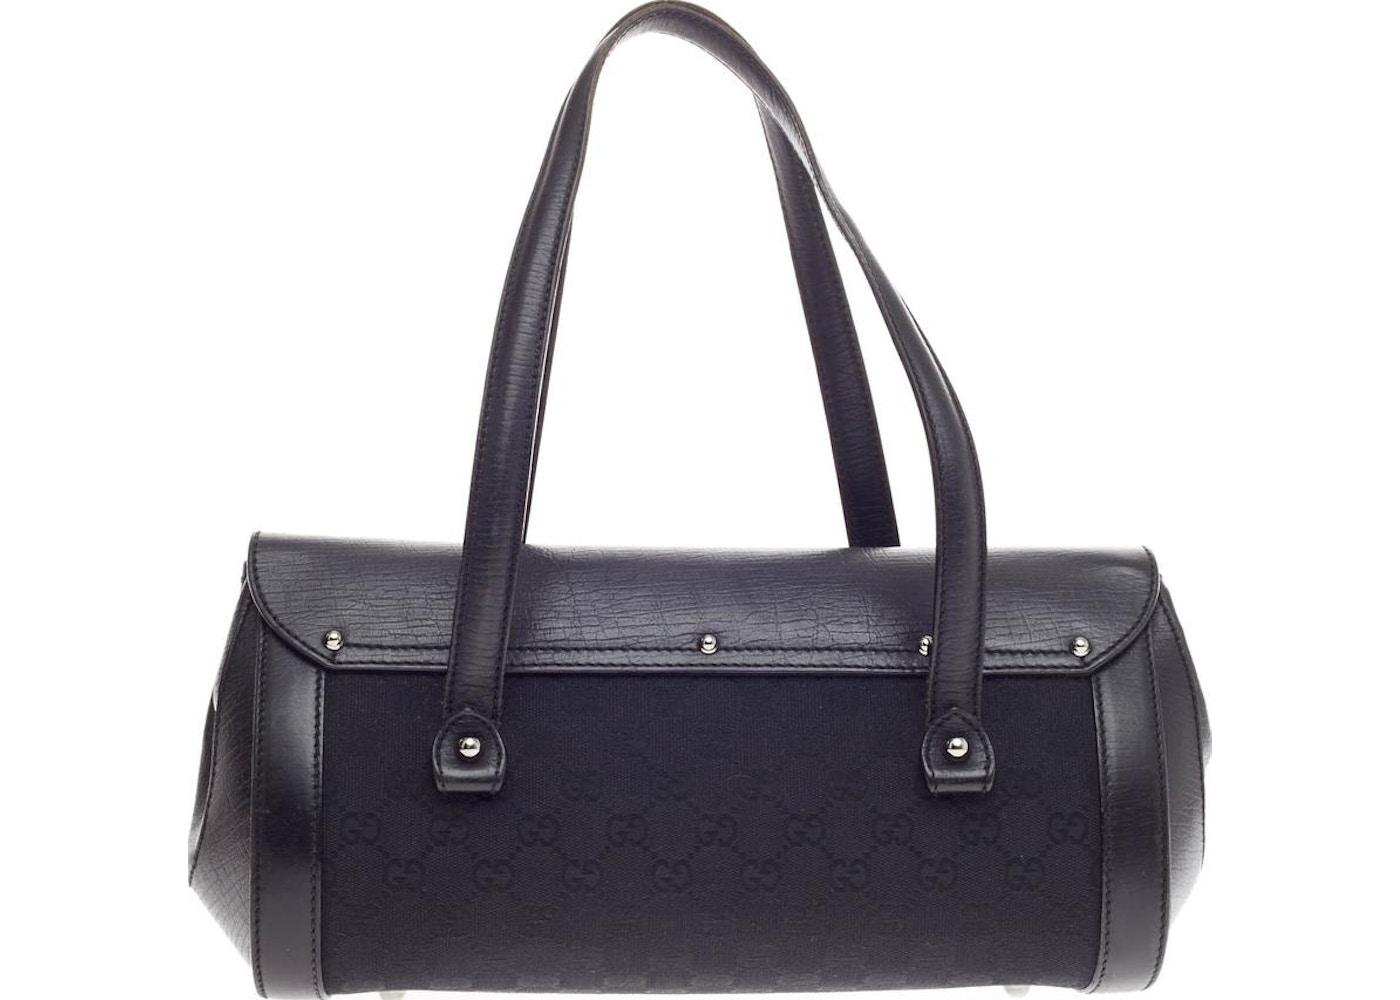 54f6979f91fc2 Gucci Bamboo Bullet Bag GG Monogram Canvas and Bamboo Details Medium Black